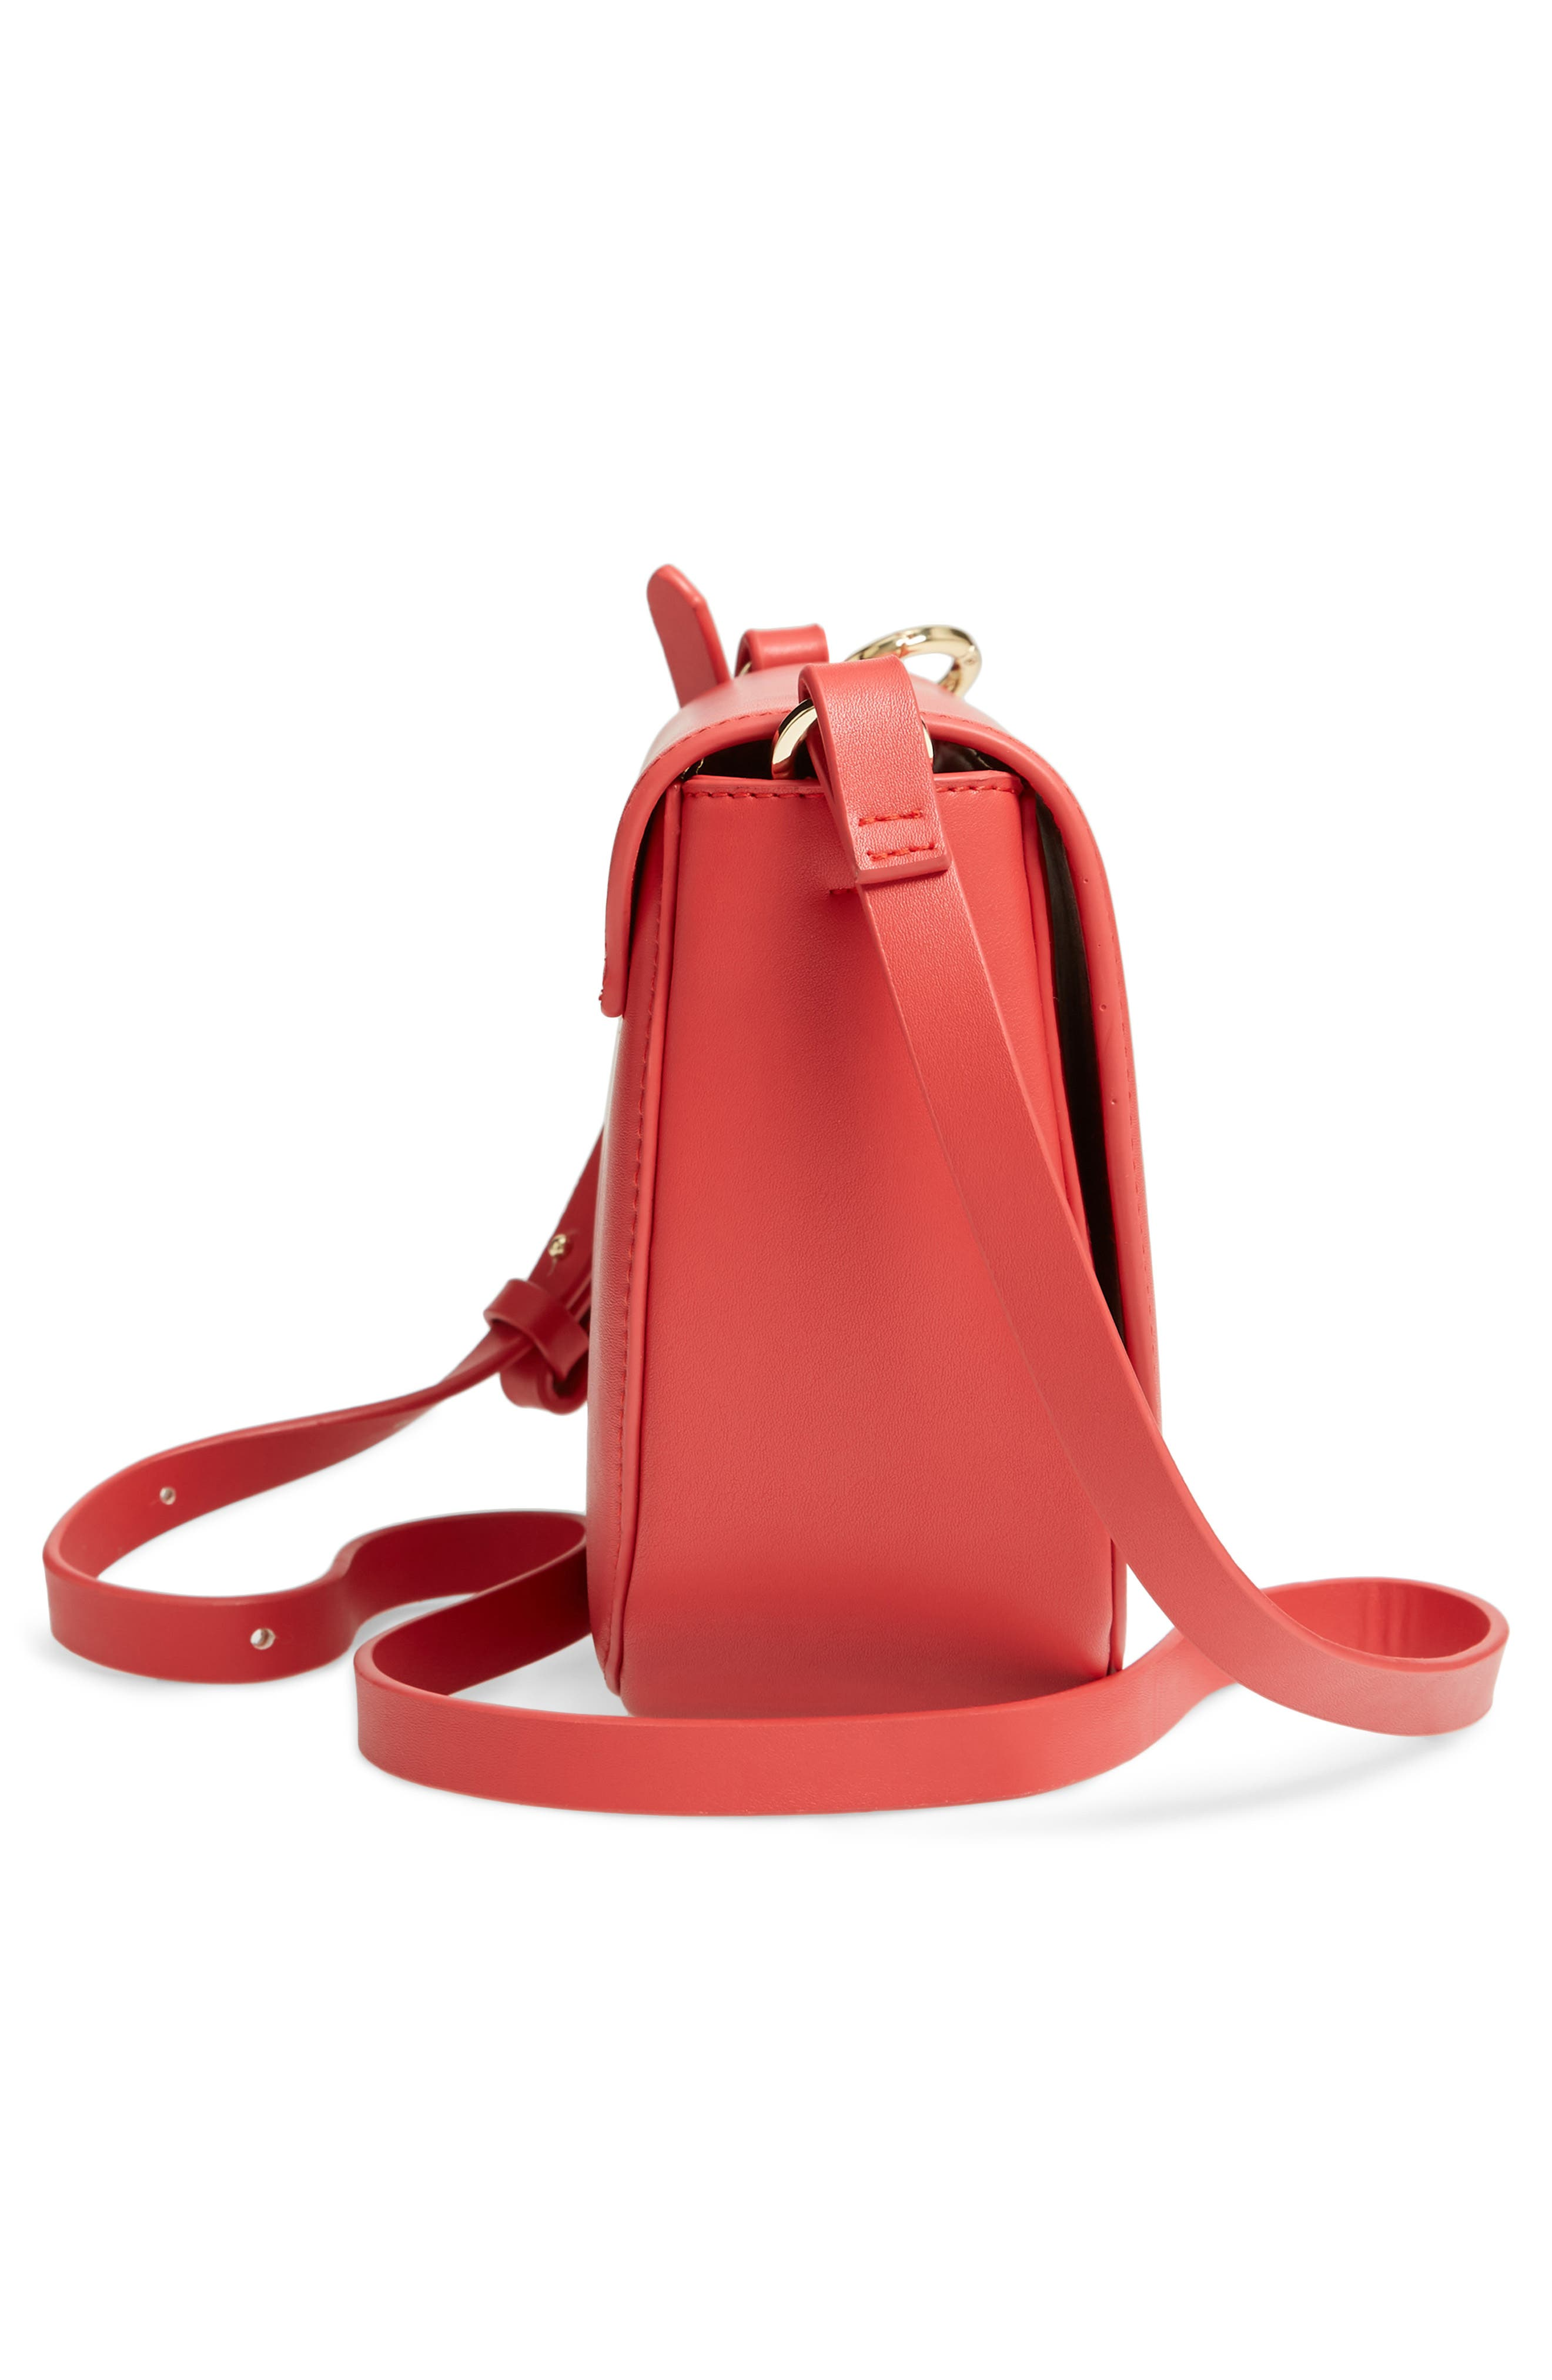 ESTELLA BARTLETT, Loman Faux Leather Saddle Bag, Alternate thumbnail 6, color, 600